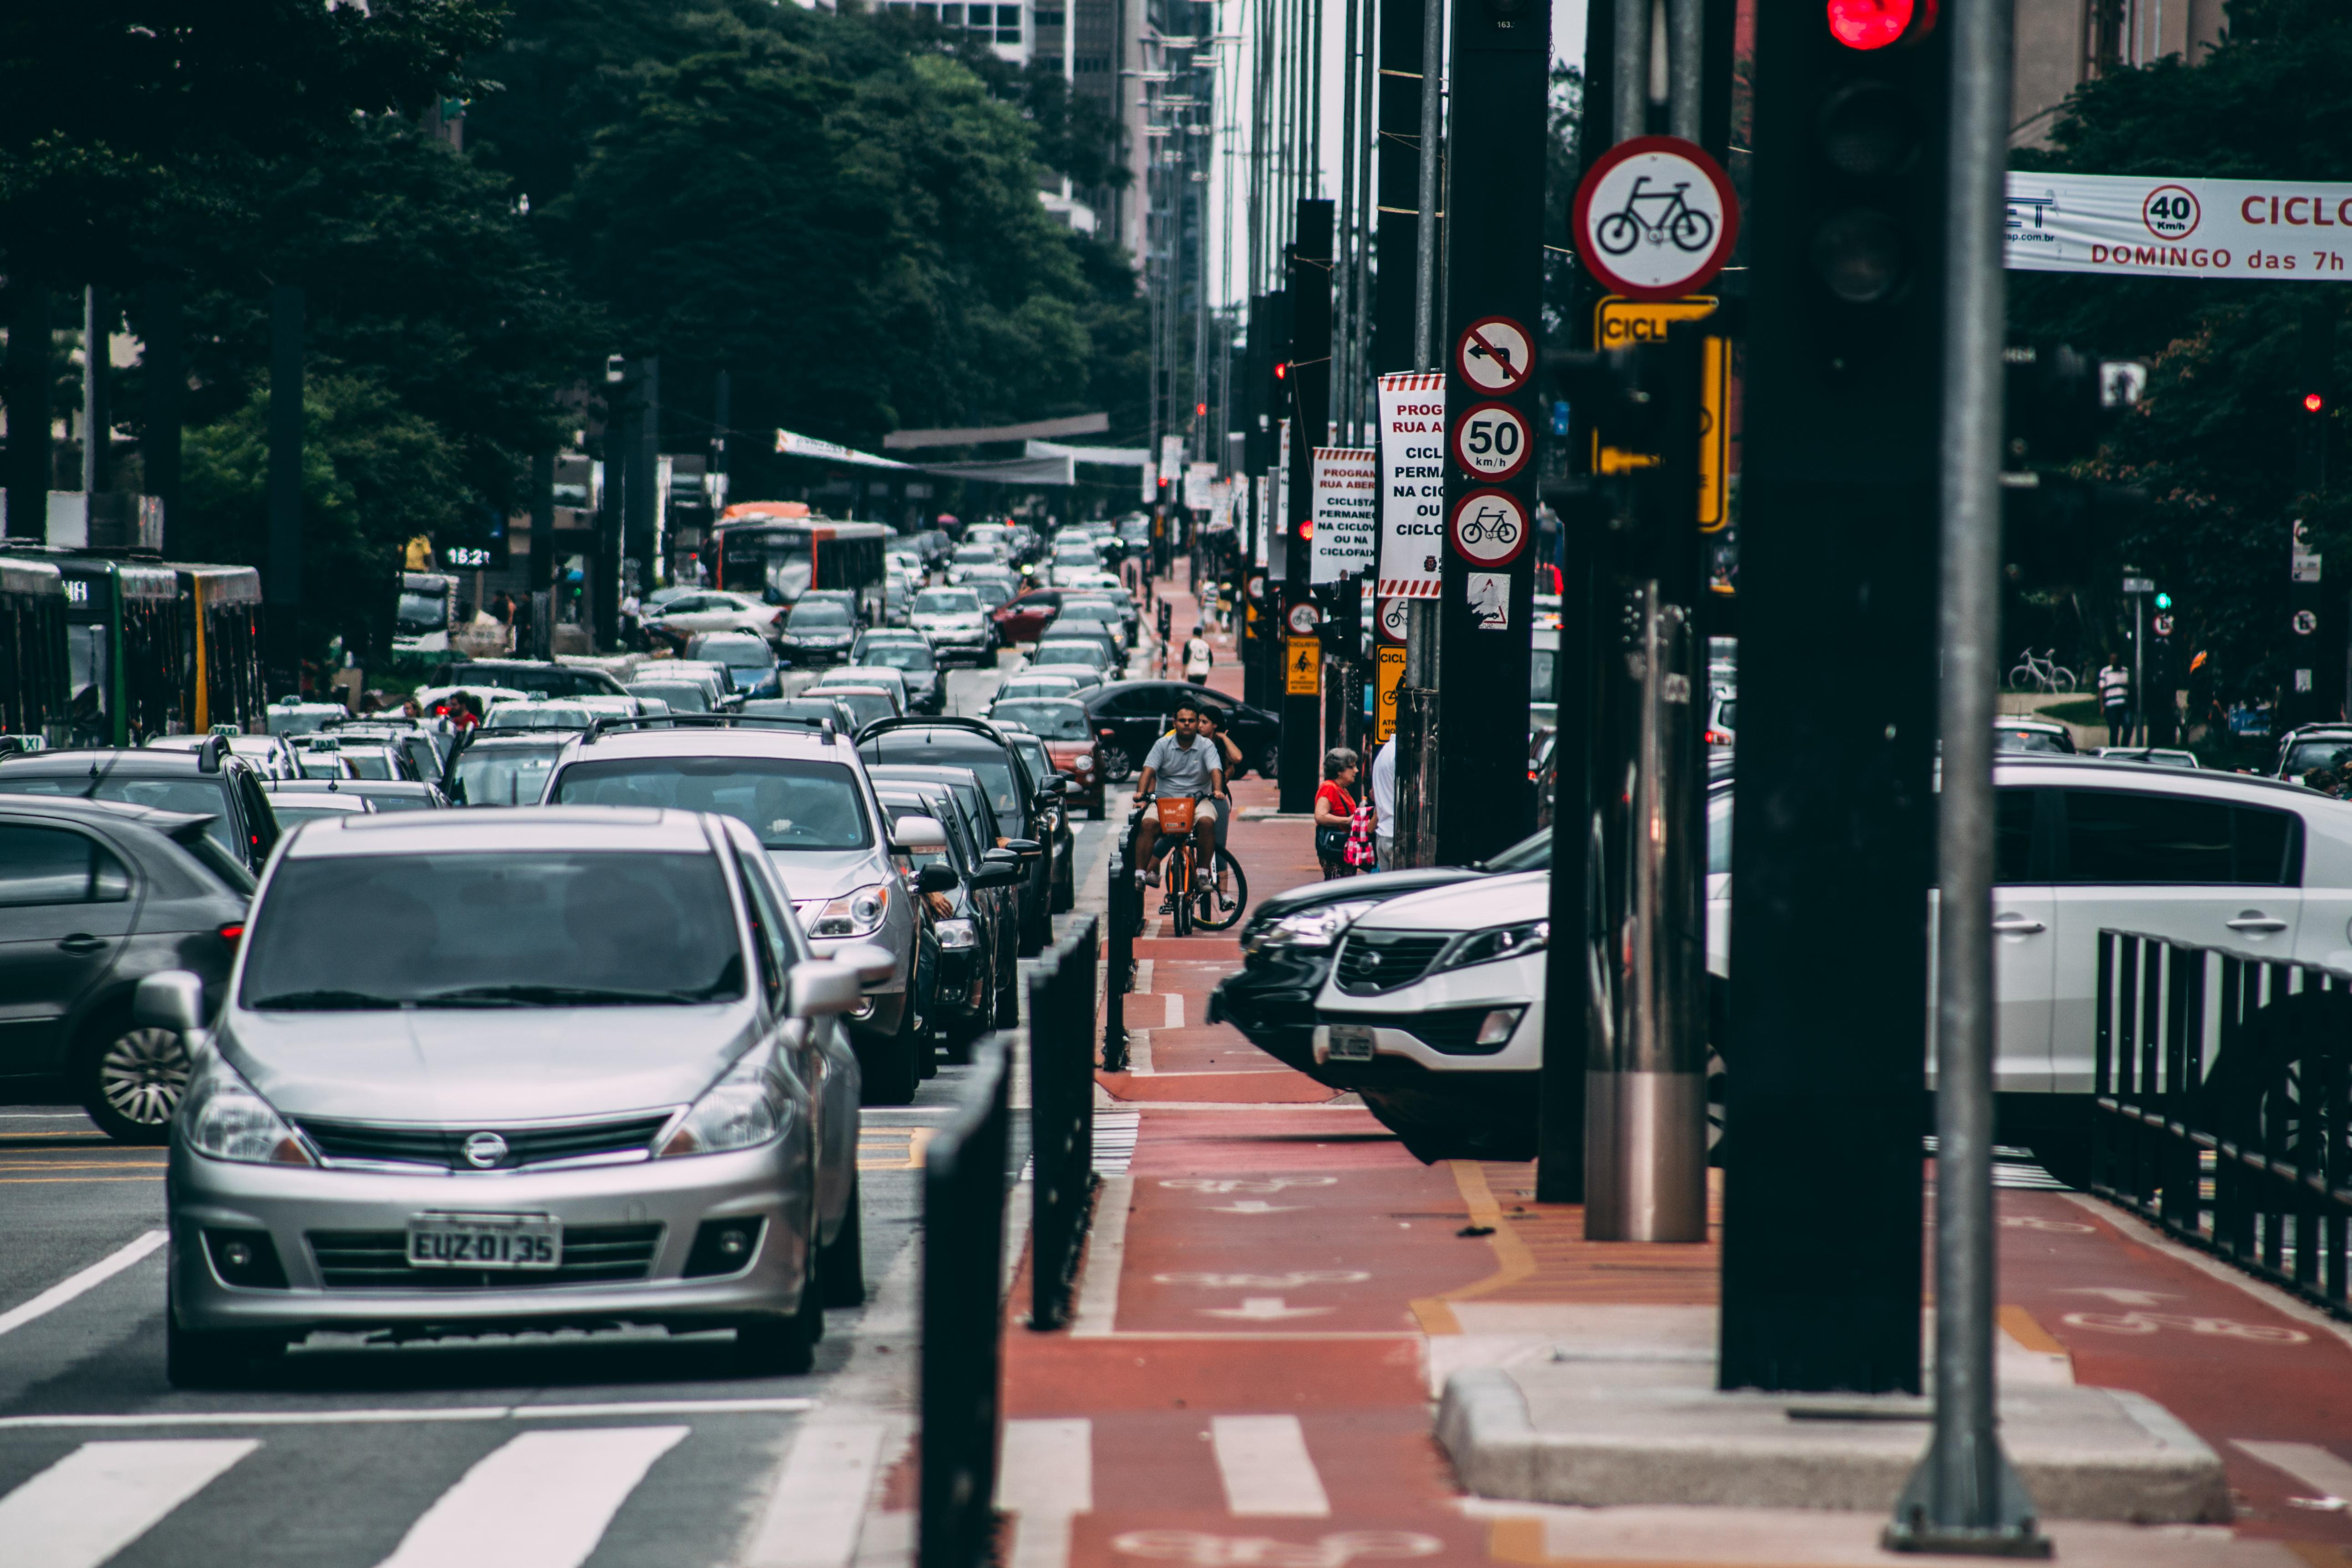 Street Activity